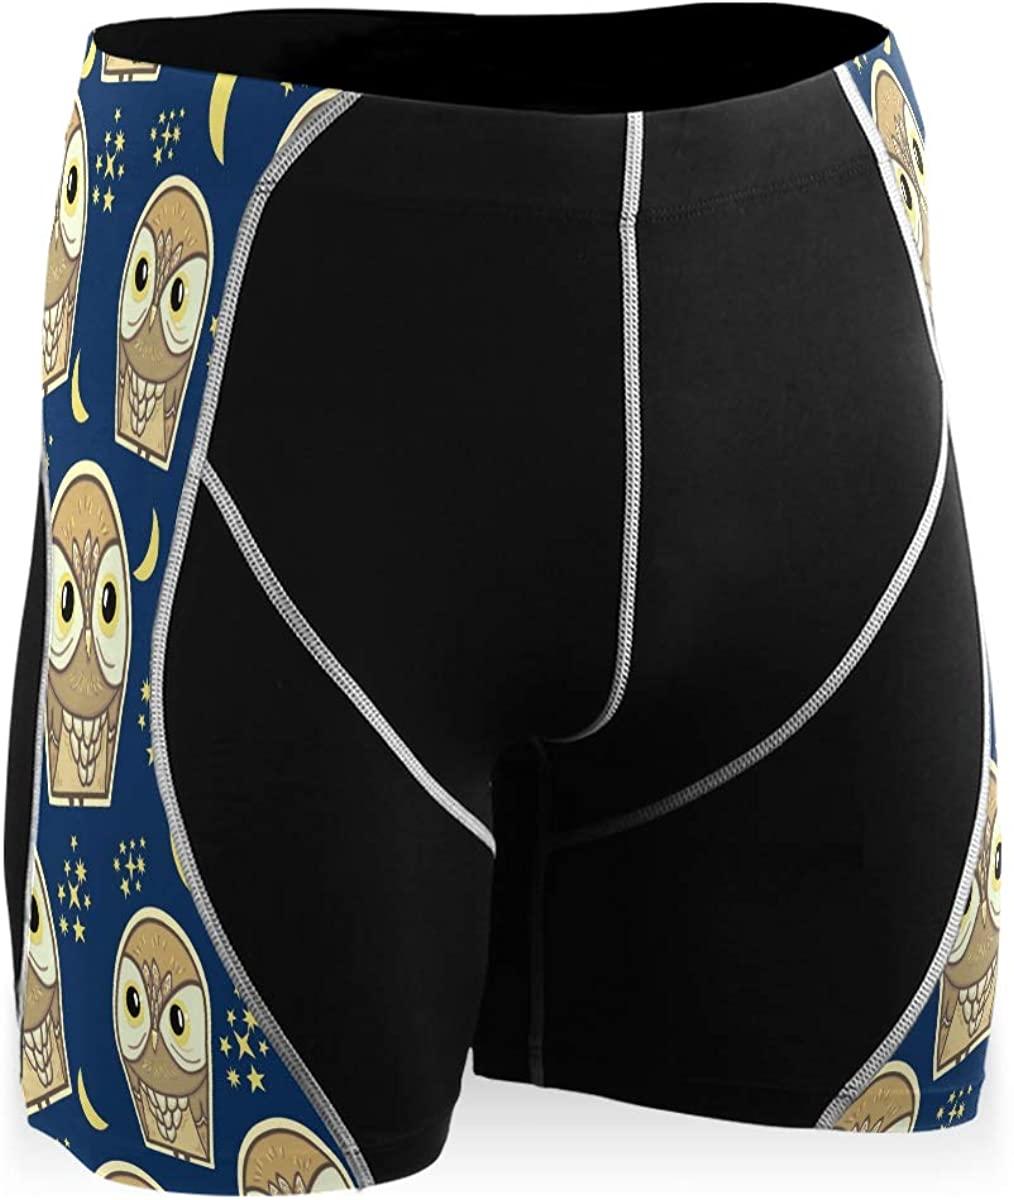 Owl Pattern Fashionable Textiles Stylish Mens Compression Shorts Running Yoga Cool Dry Baselayer Boys